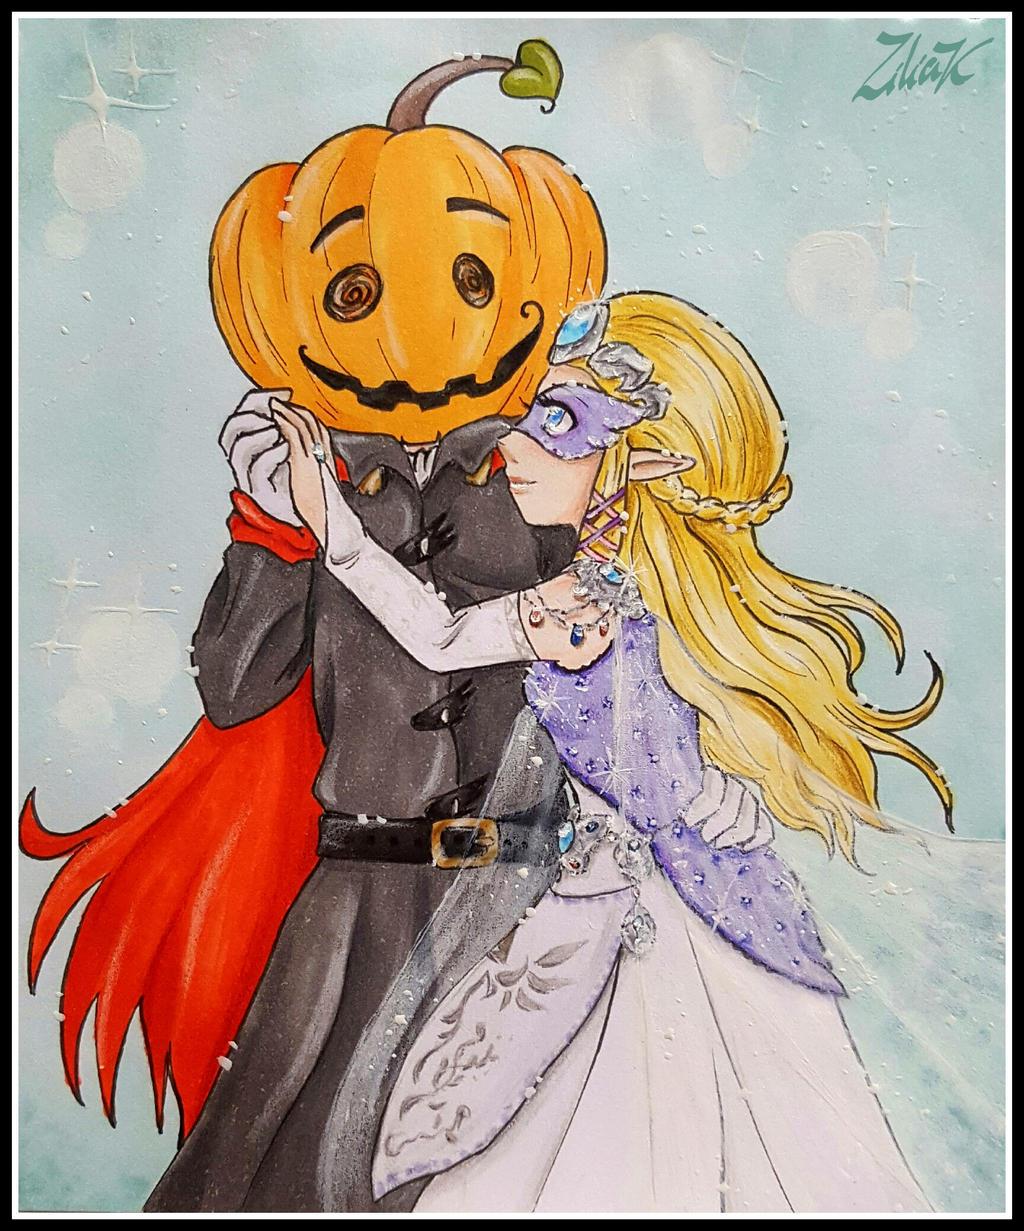 Laughing pumpkin by zilia-k